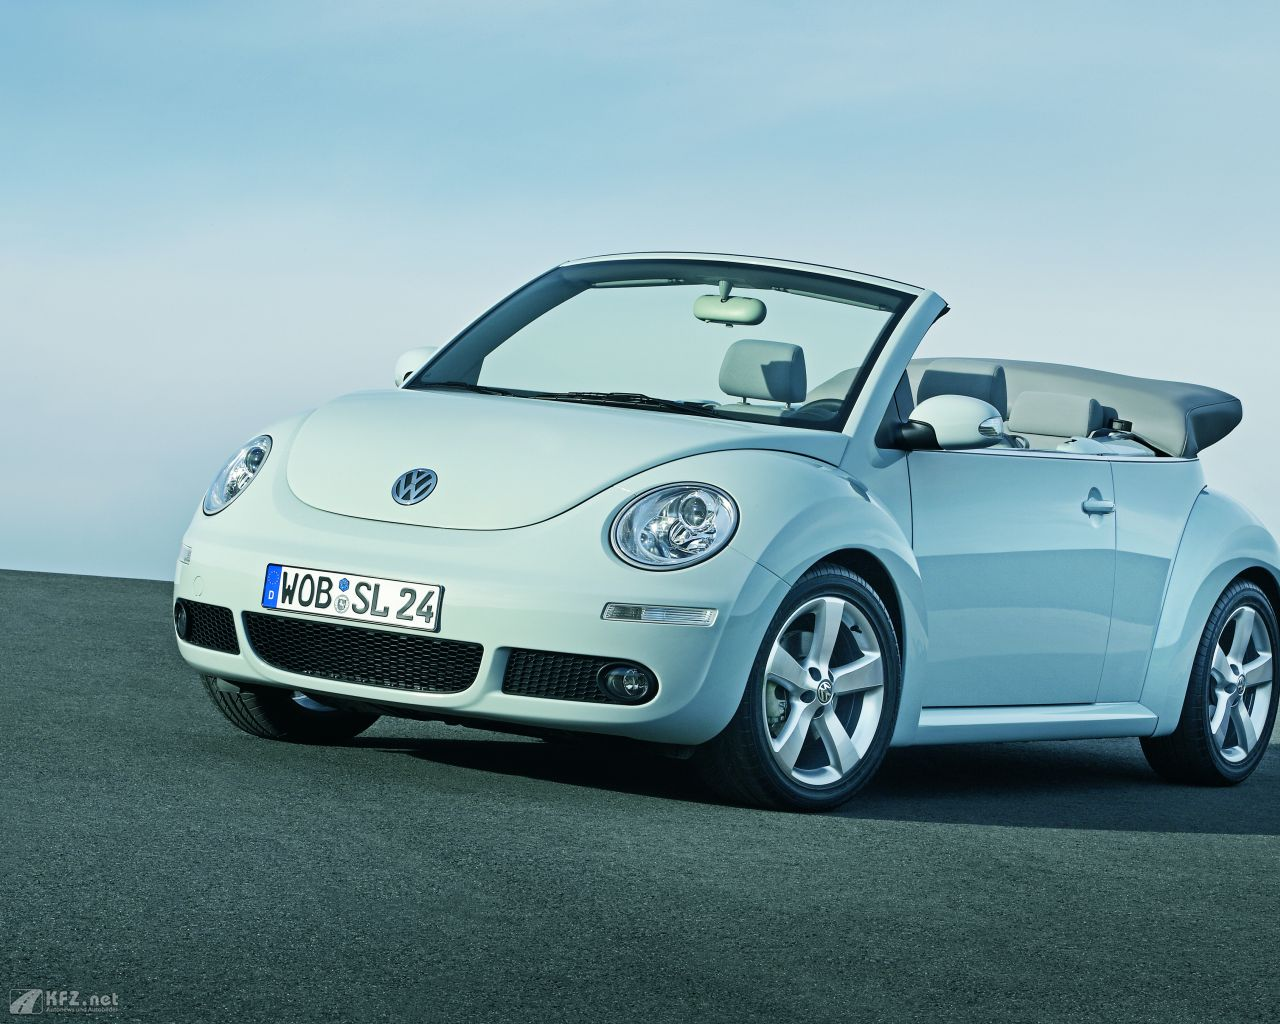 vw-beetle-1280x1024-1